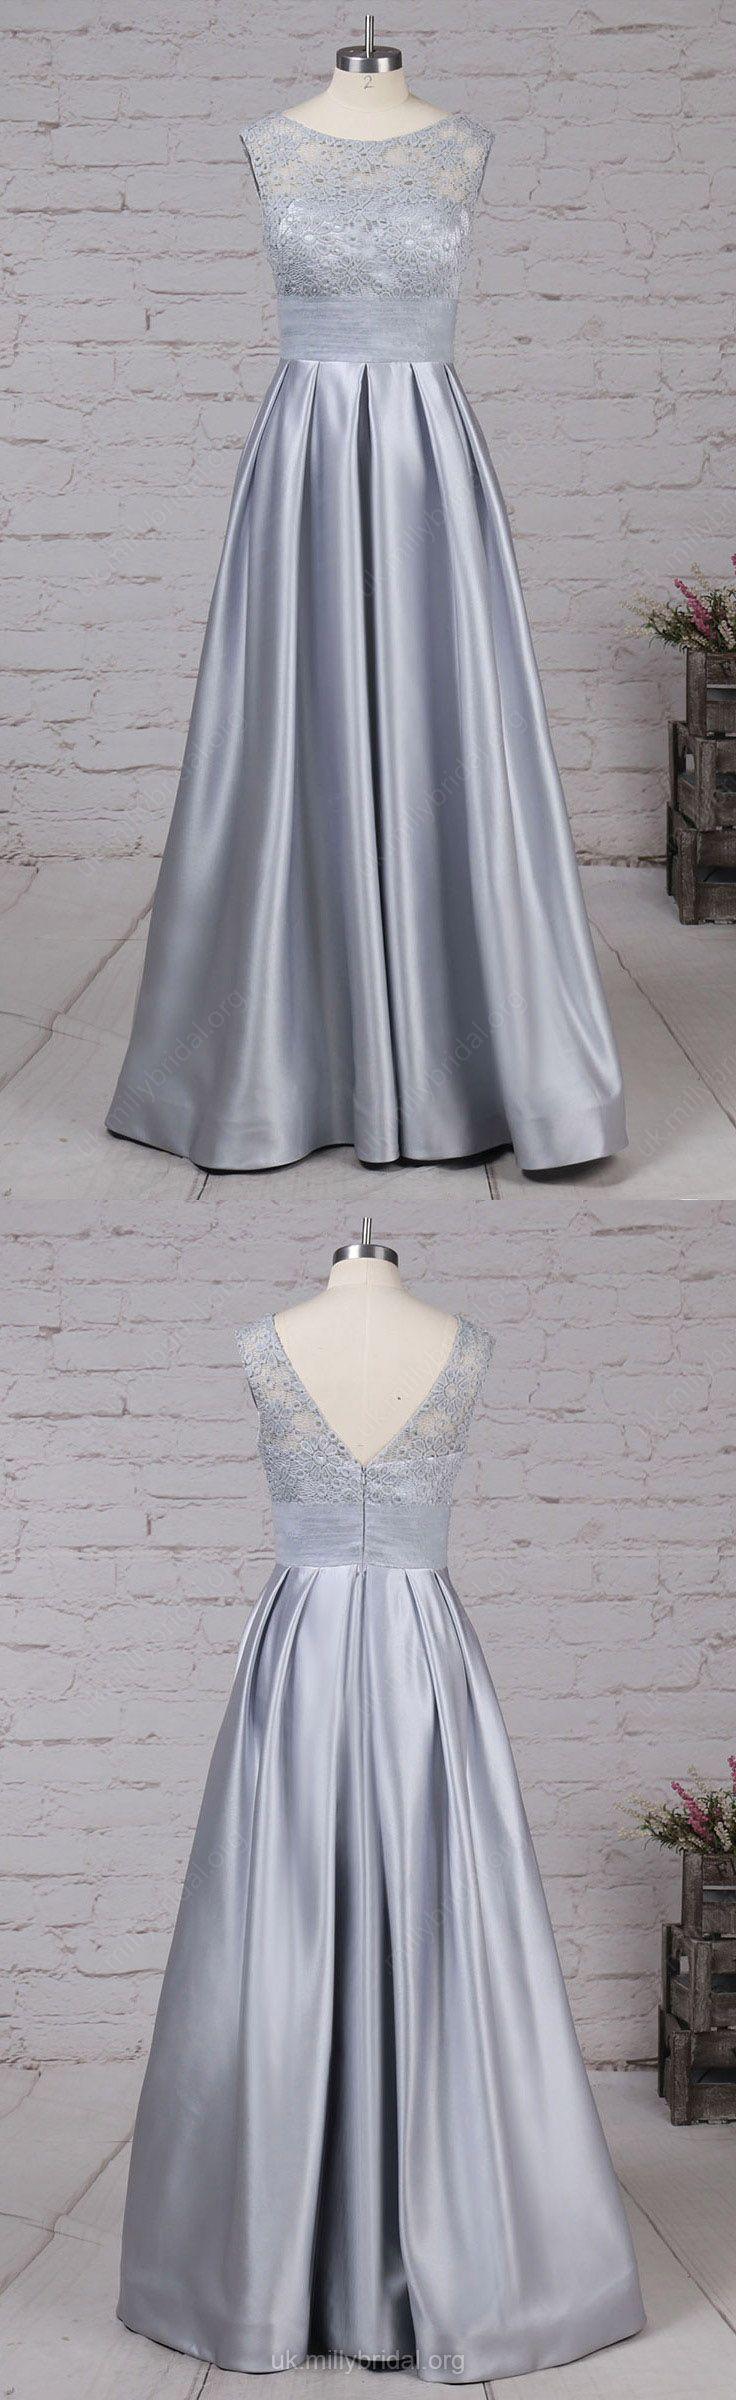 Lace prom dressessilver prom dresseslong prom dressessatin prom